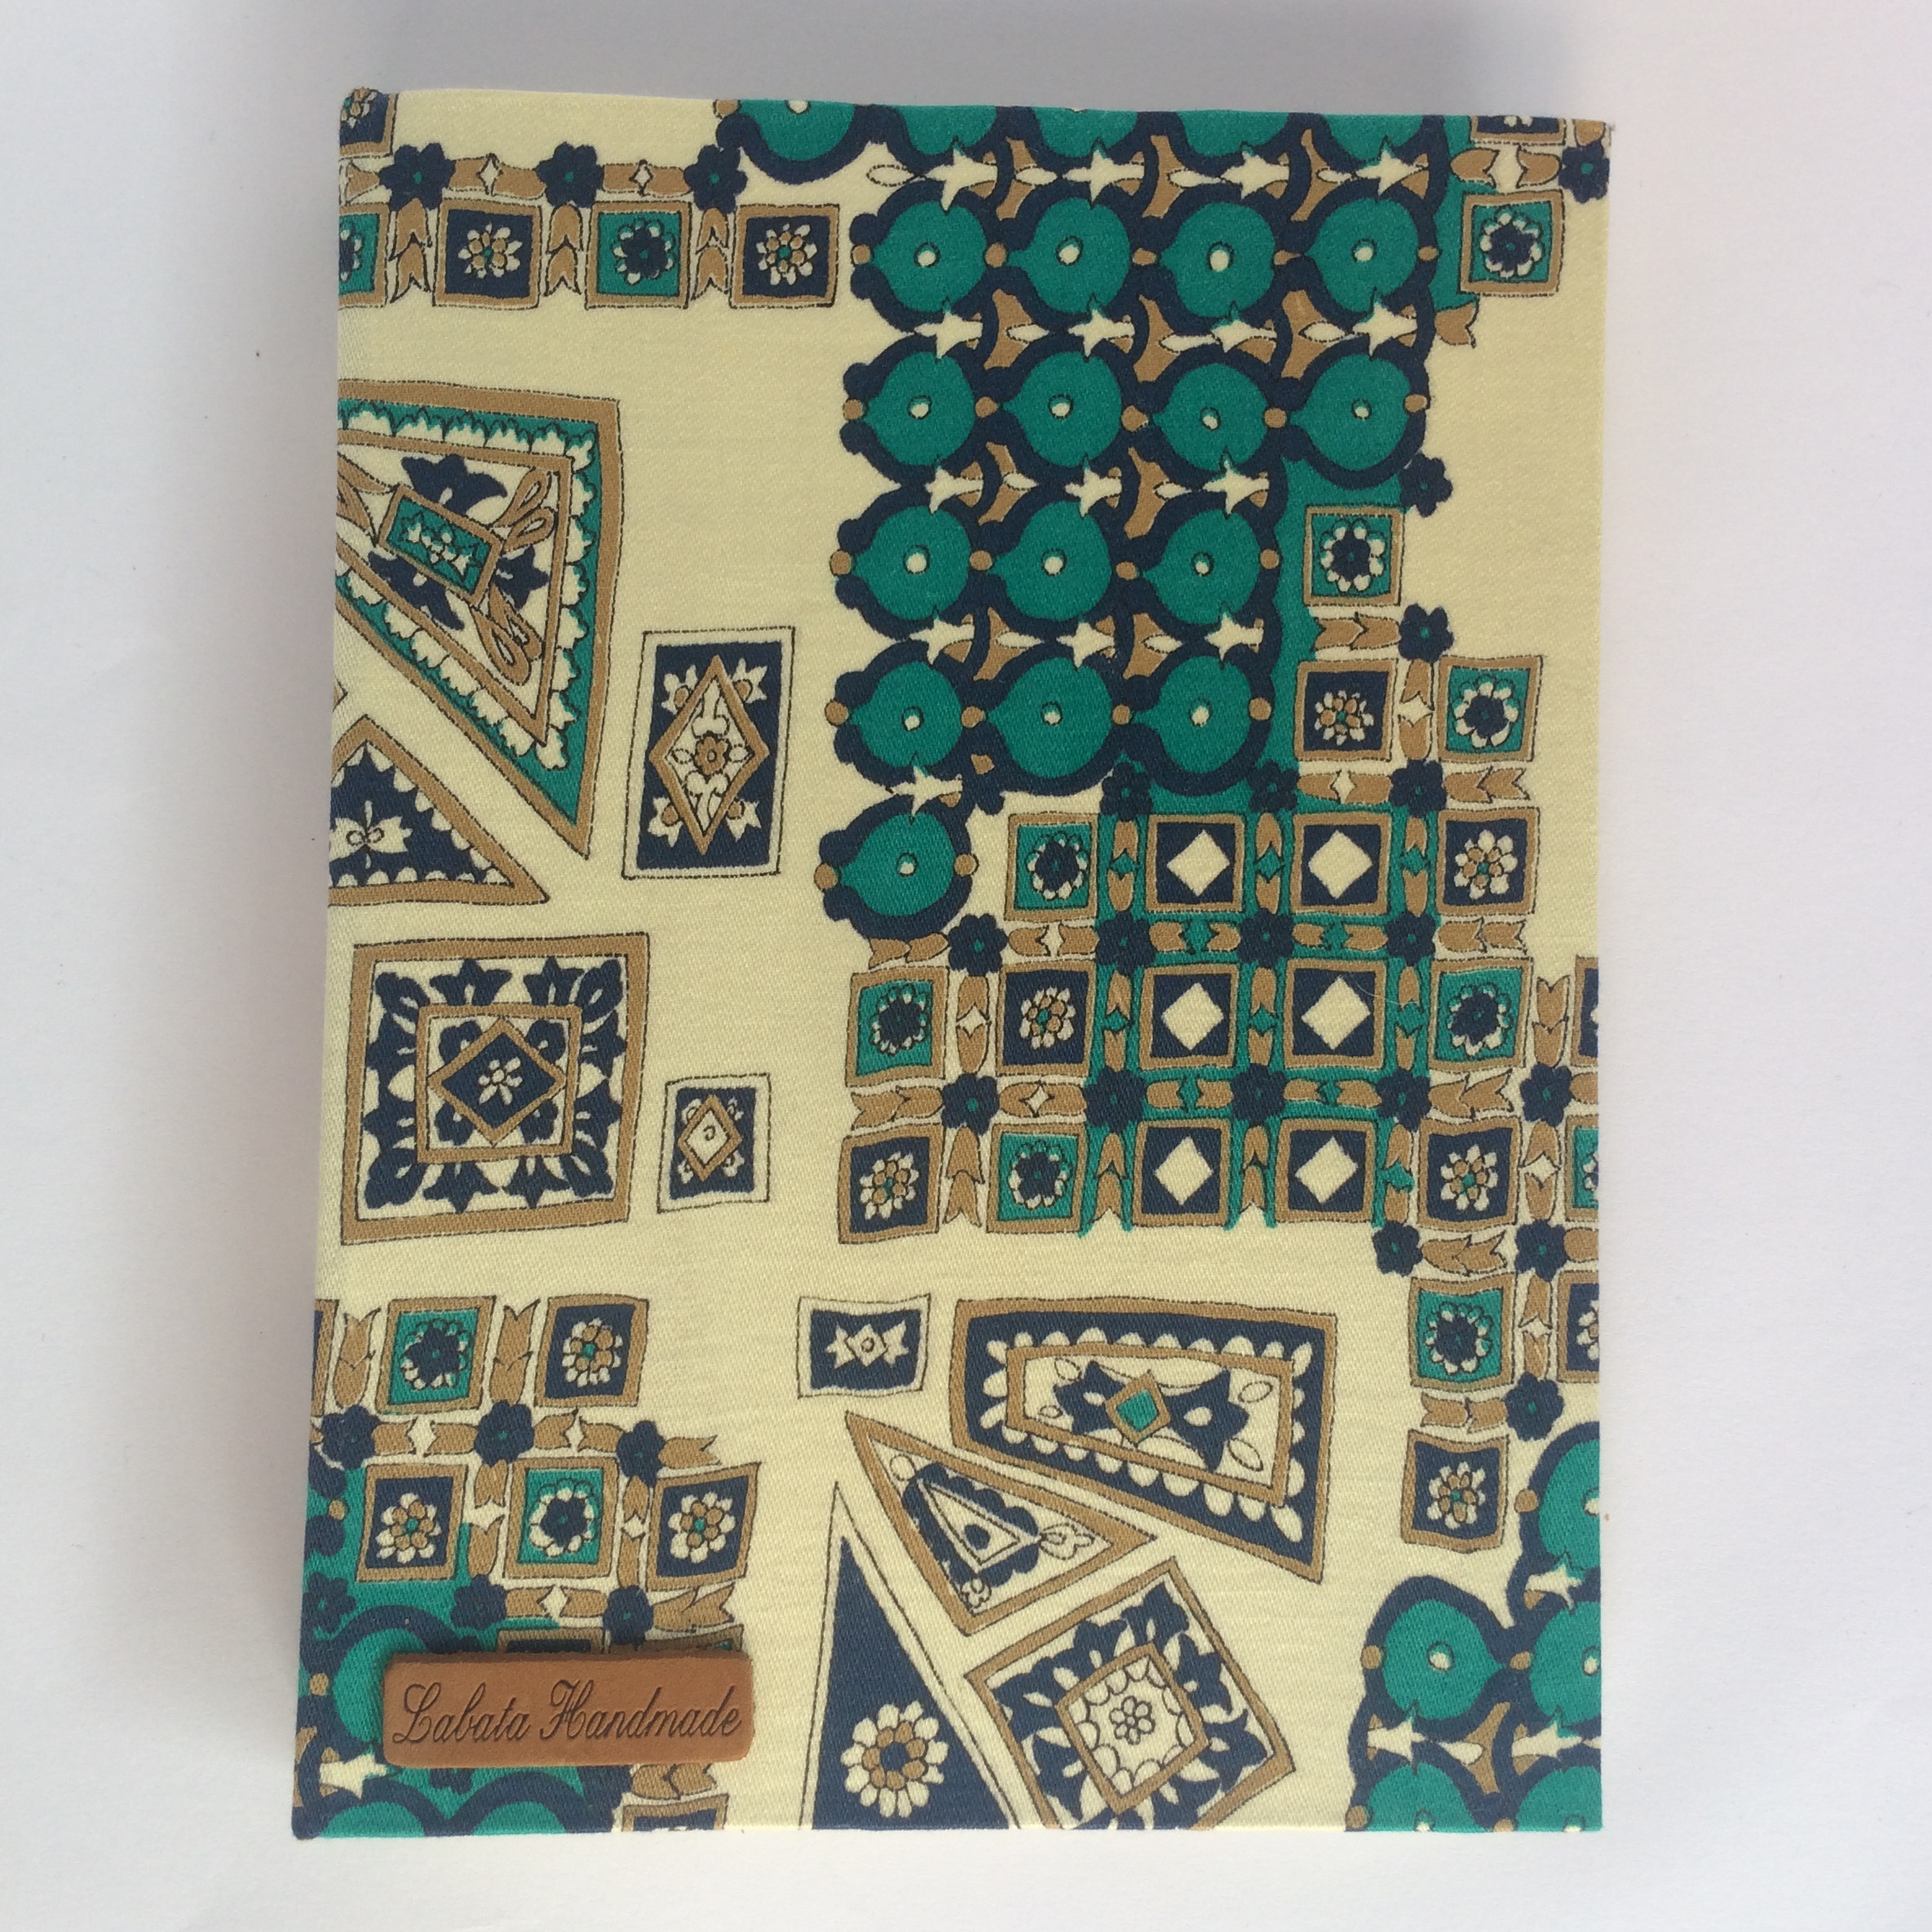 Sổ tay Handmade Labata Hoa Văn 94